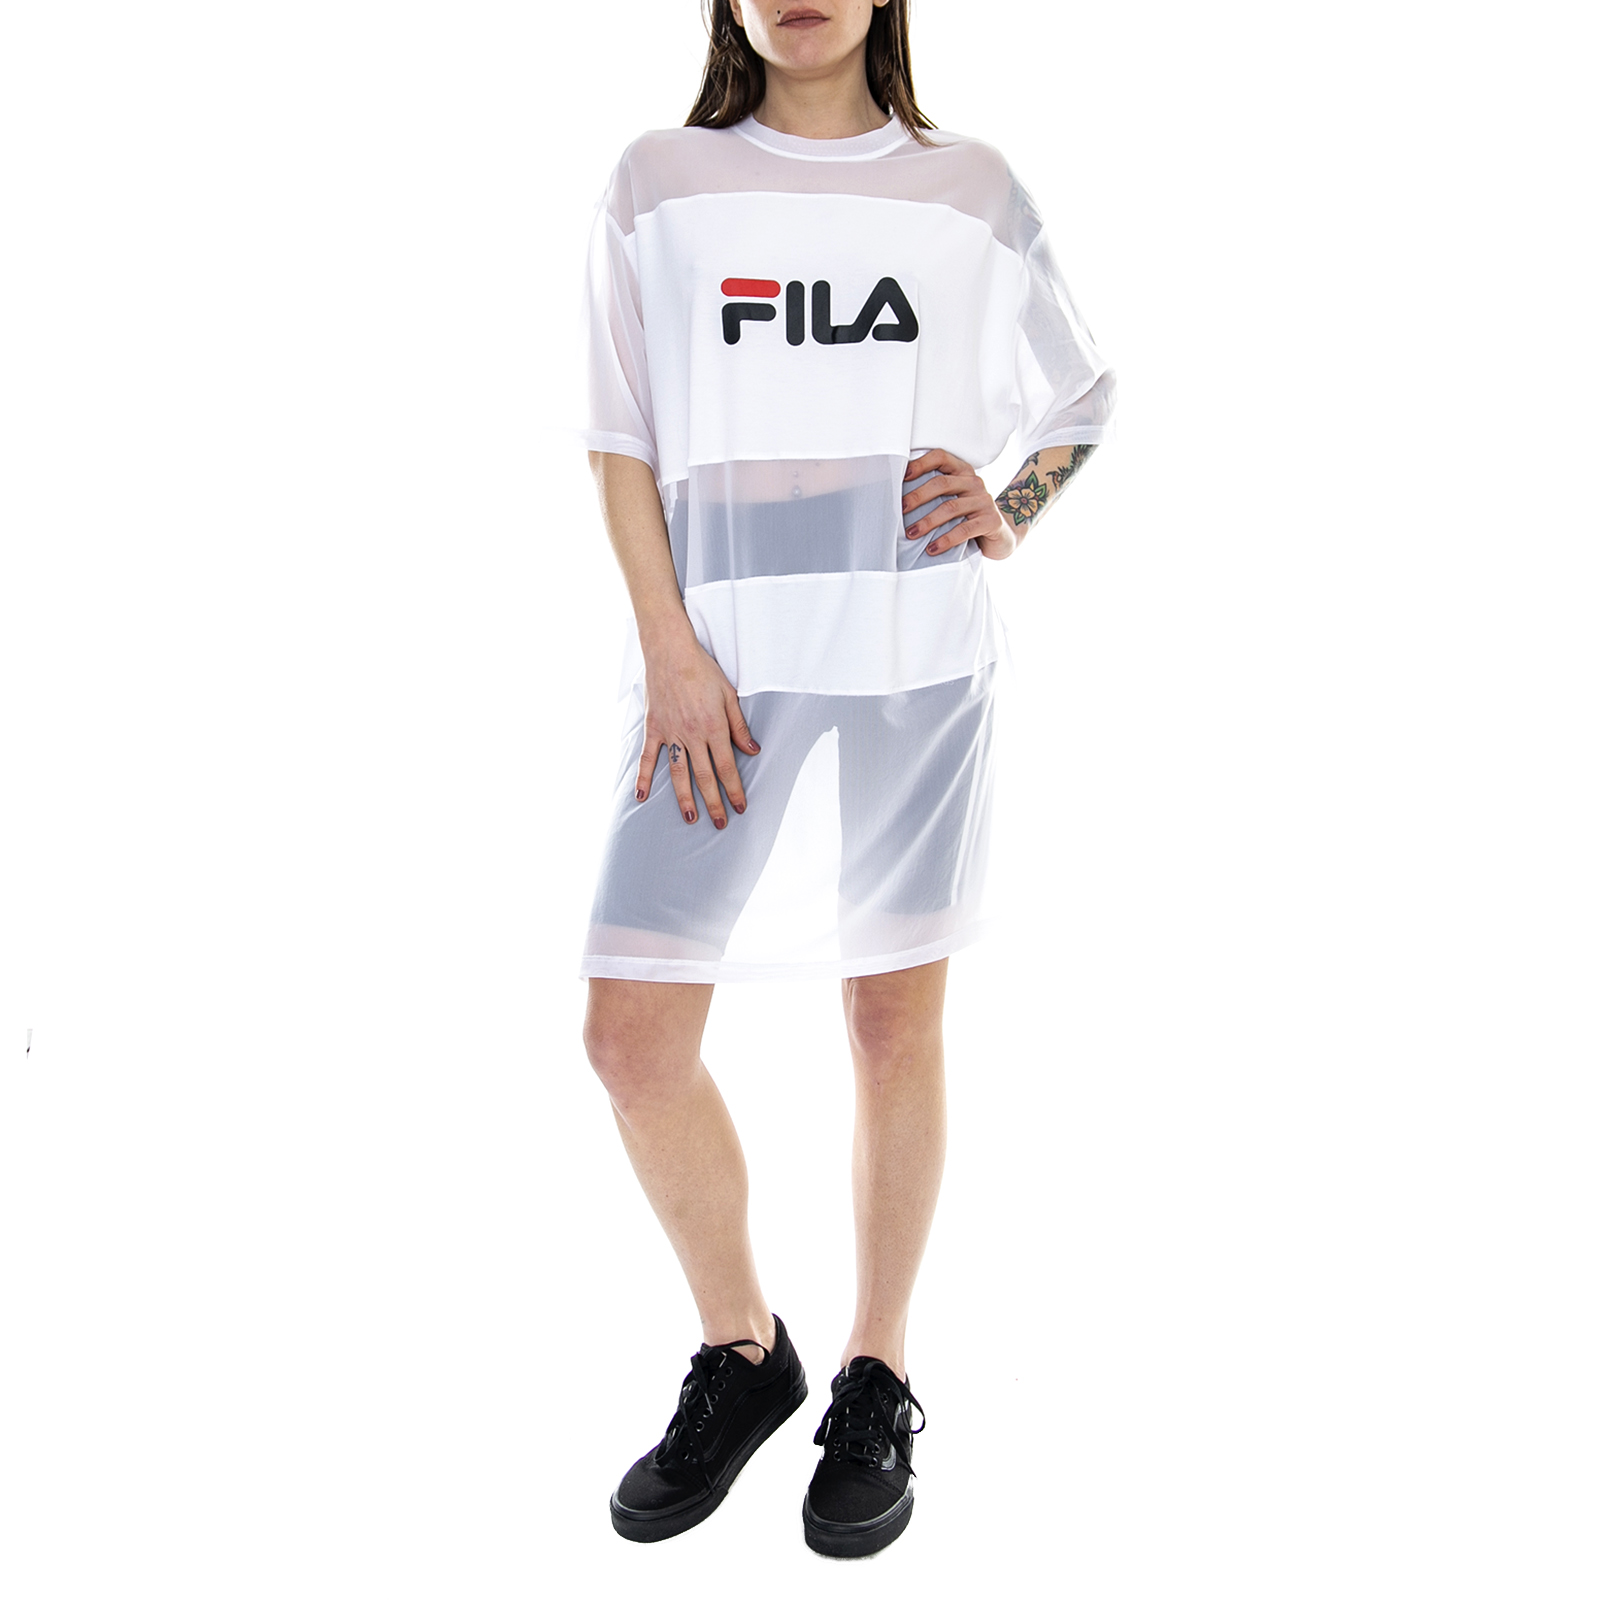 01ed7636da Details about Fila T-Shirt Women Emily Tee Dress Bright White